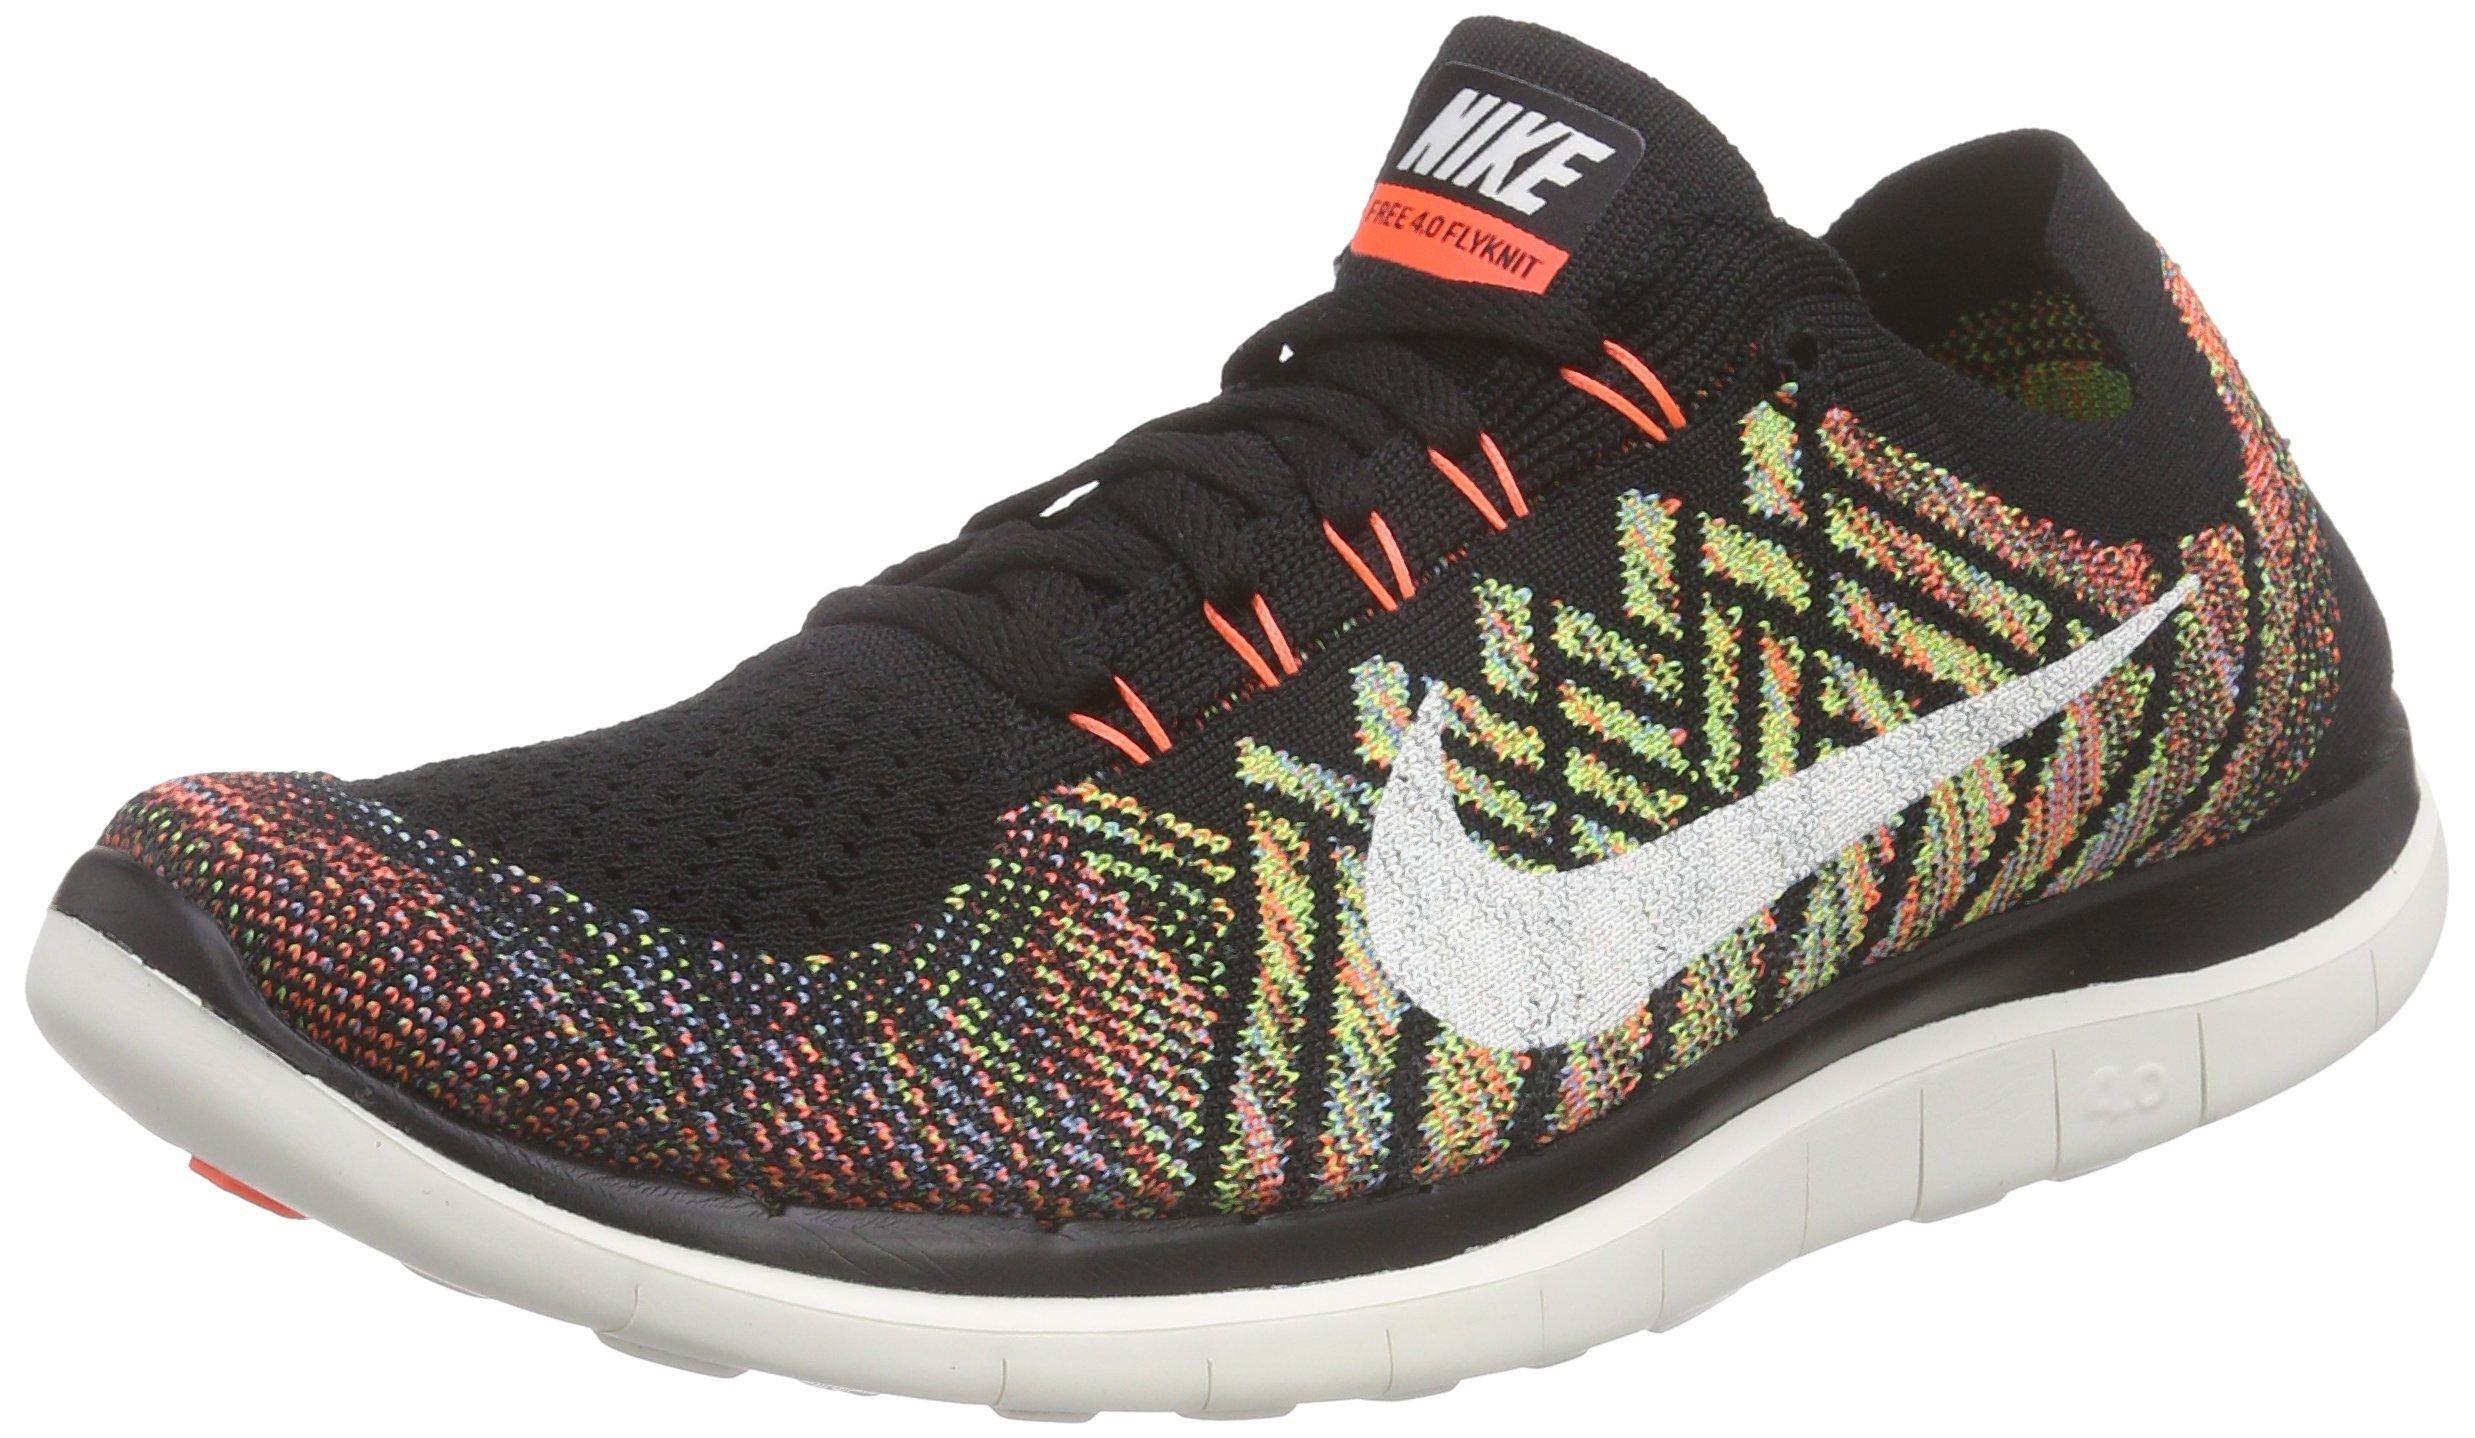 another chance 8f888 eb54a Nike Men's Free 4.0 Flyknit Running Shoe, BLACK/SAIL-HYPER  ORANGE-UNIVERSITY BLUE, Size 9 D(M) US